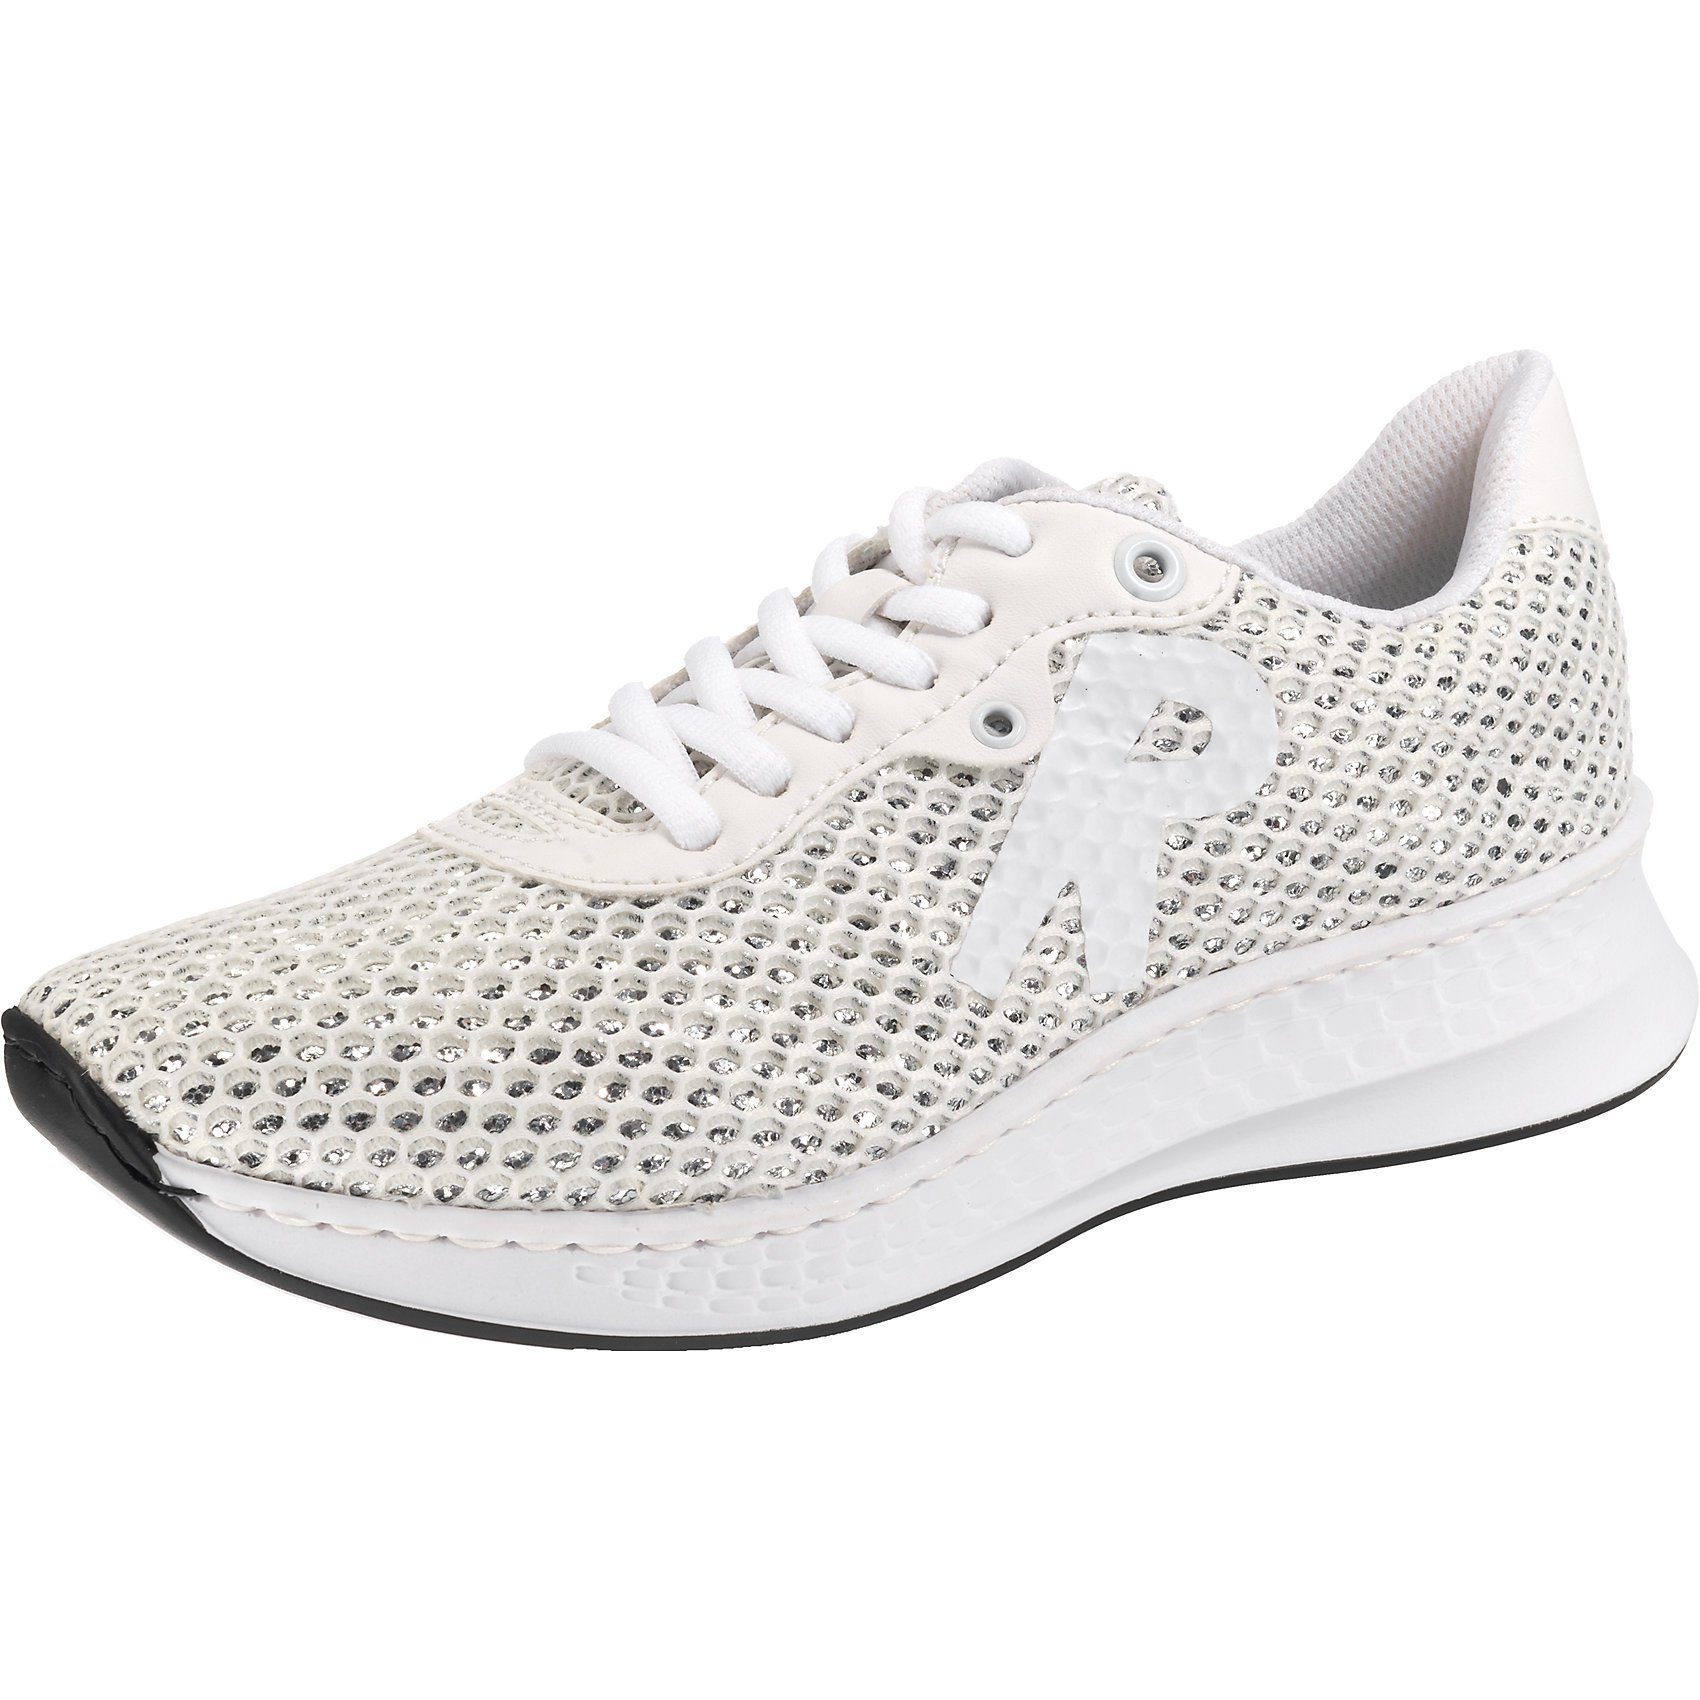 rieker Sneakers online kaufen  weiß-kombi